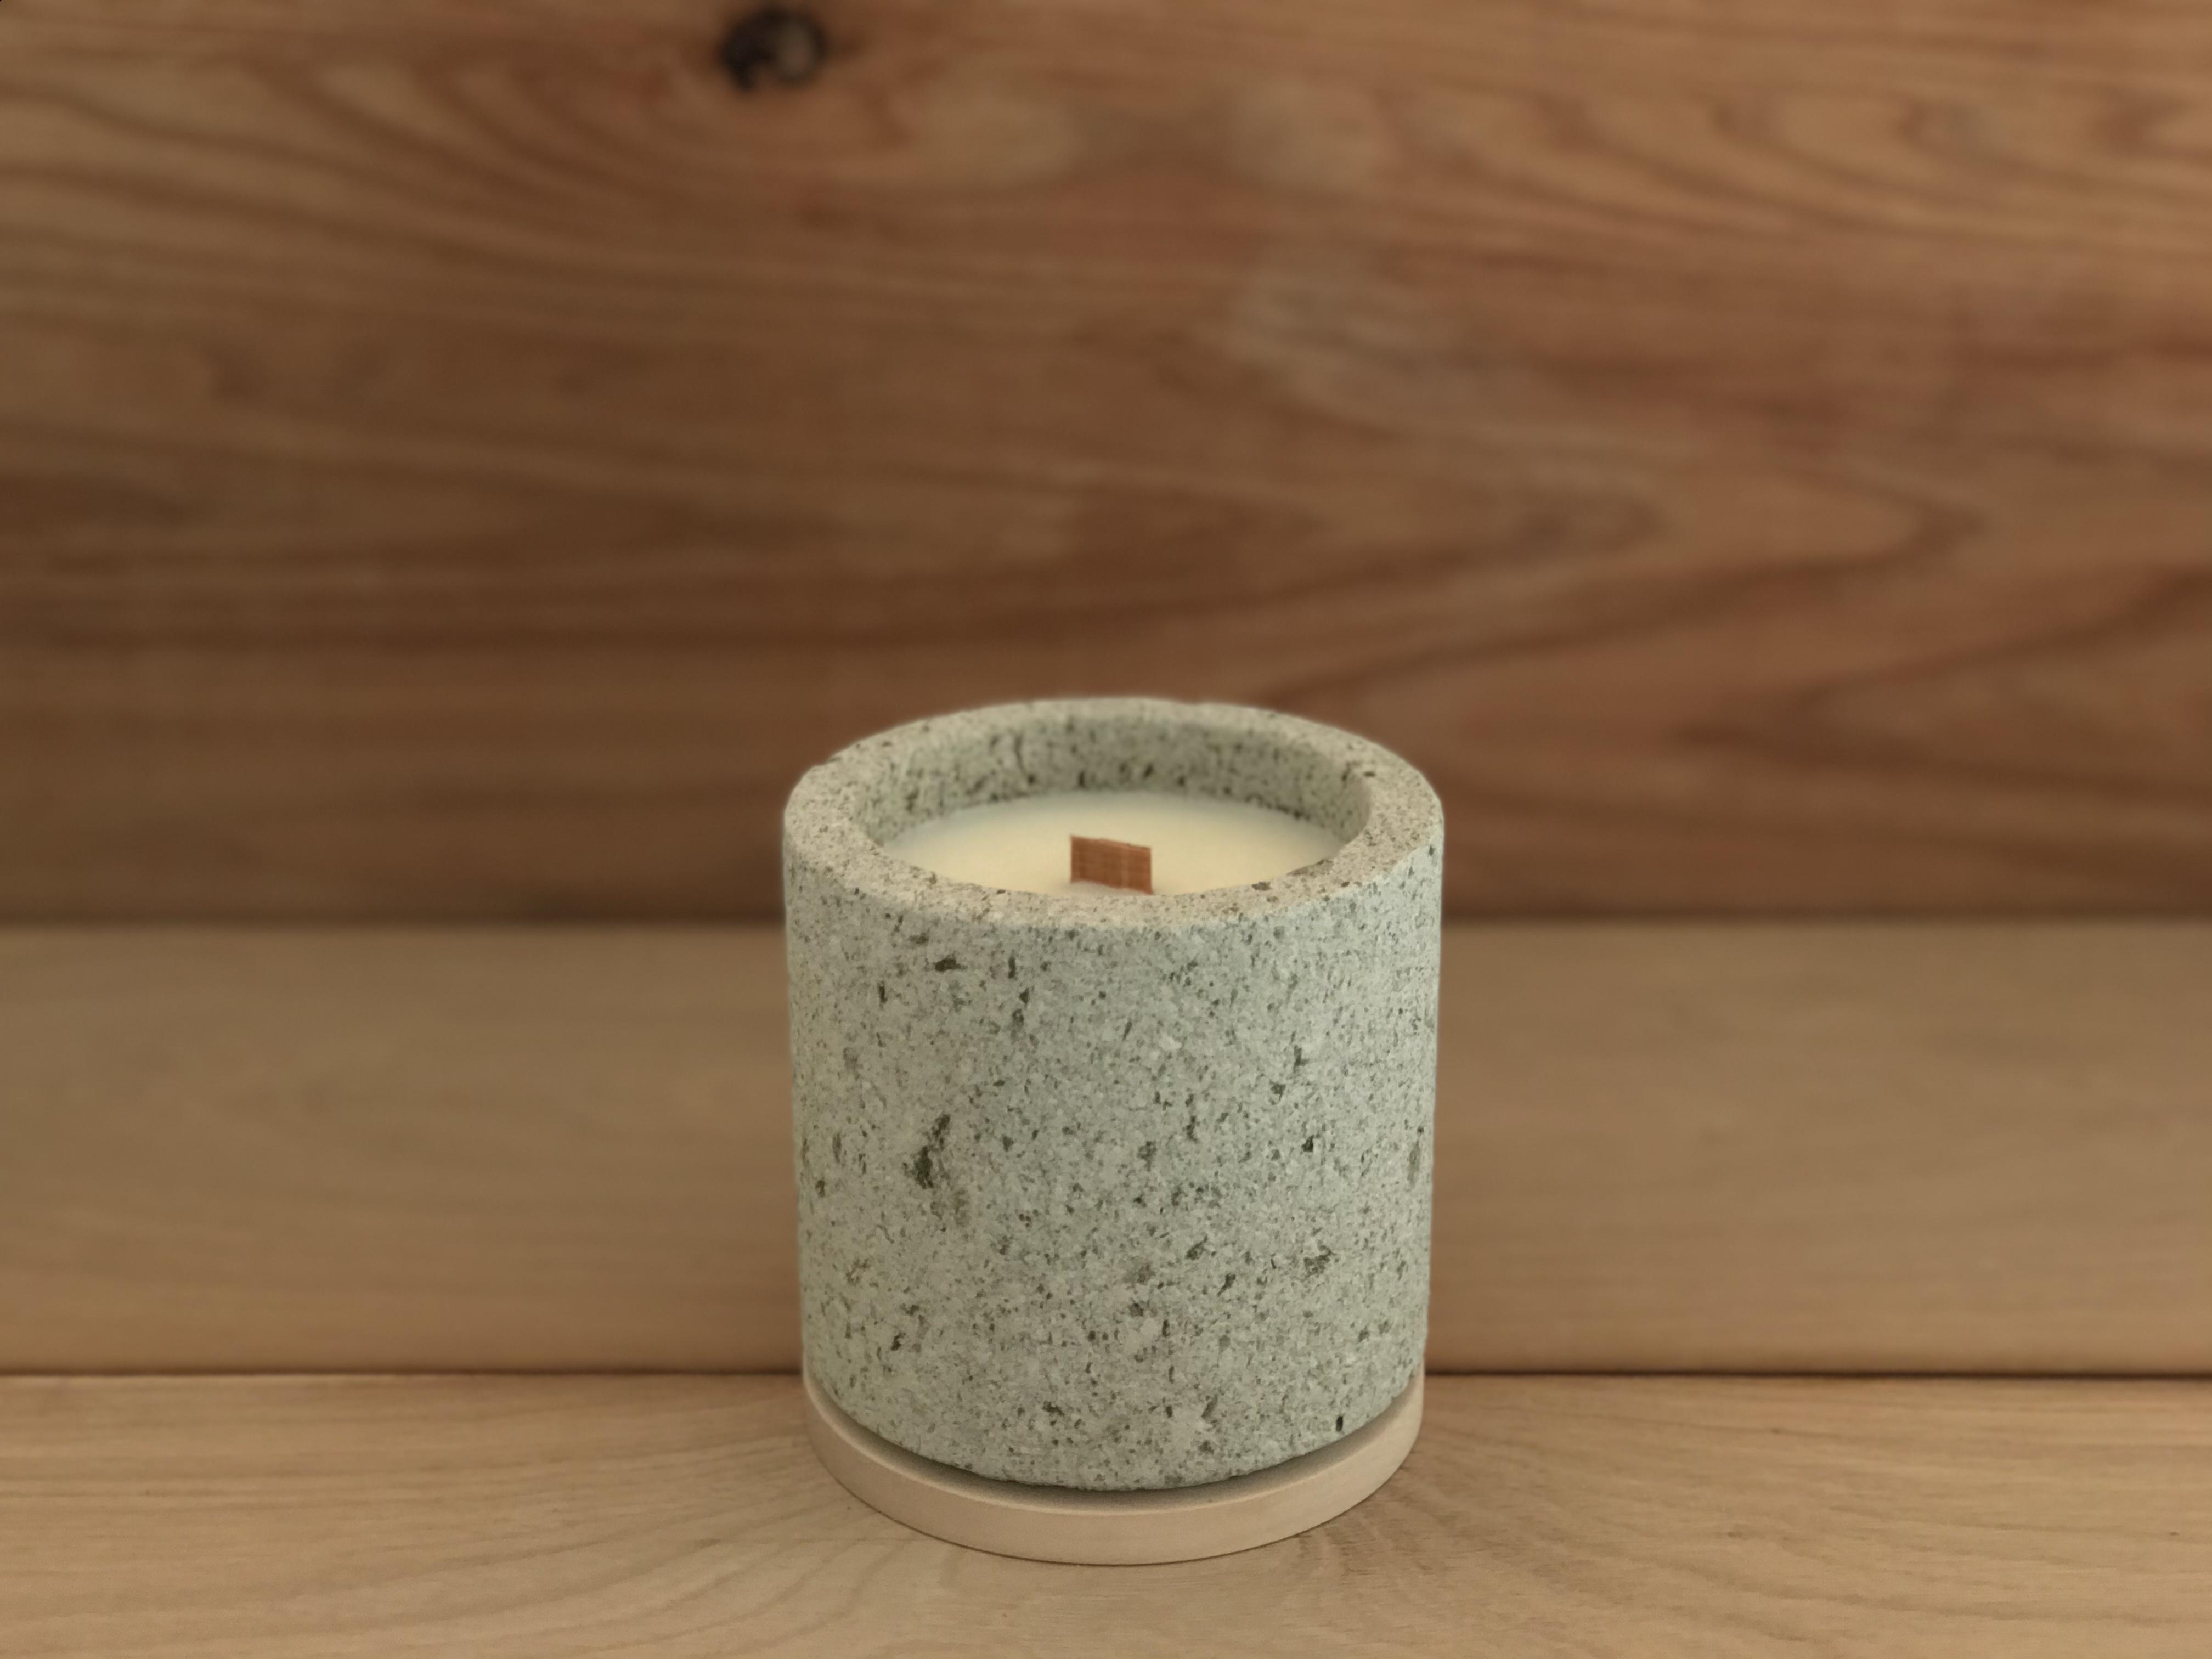 【NEW】takibi (cylinder) 大谷石 キャンドル